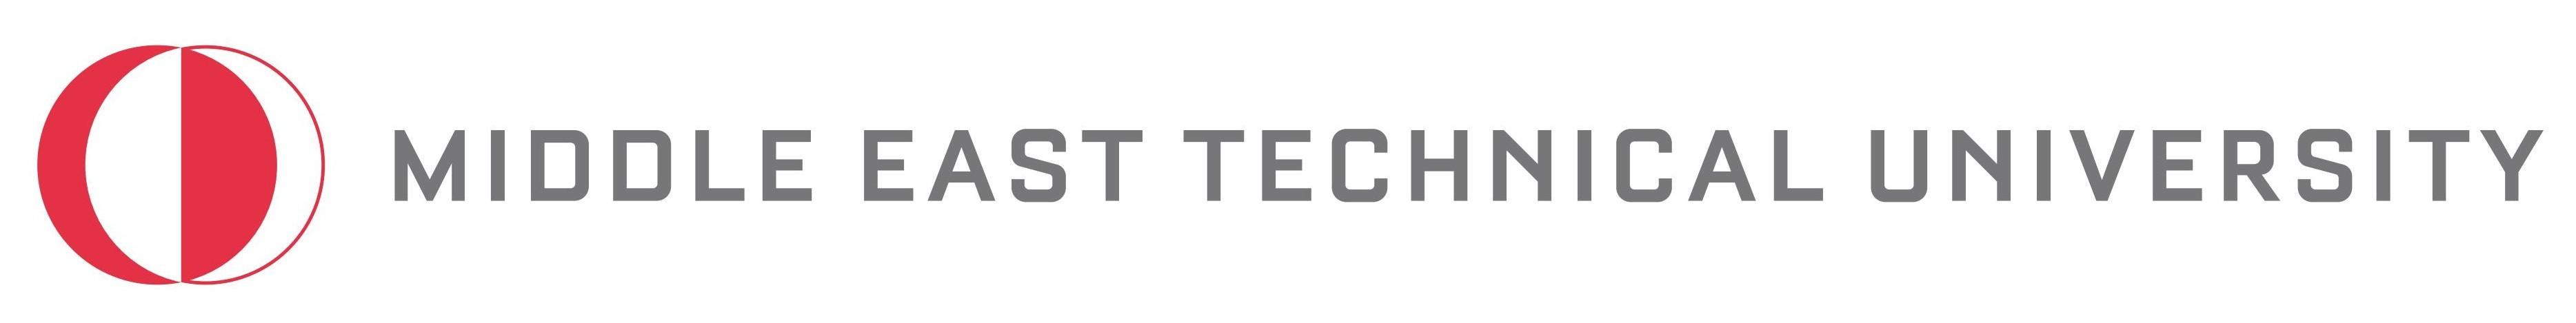 ODTU_Orta_Dogu_Teknik_Üniversitesi_Logo4